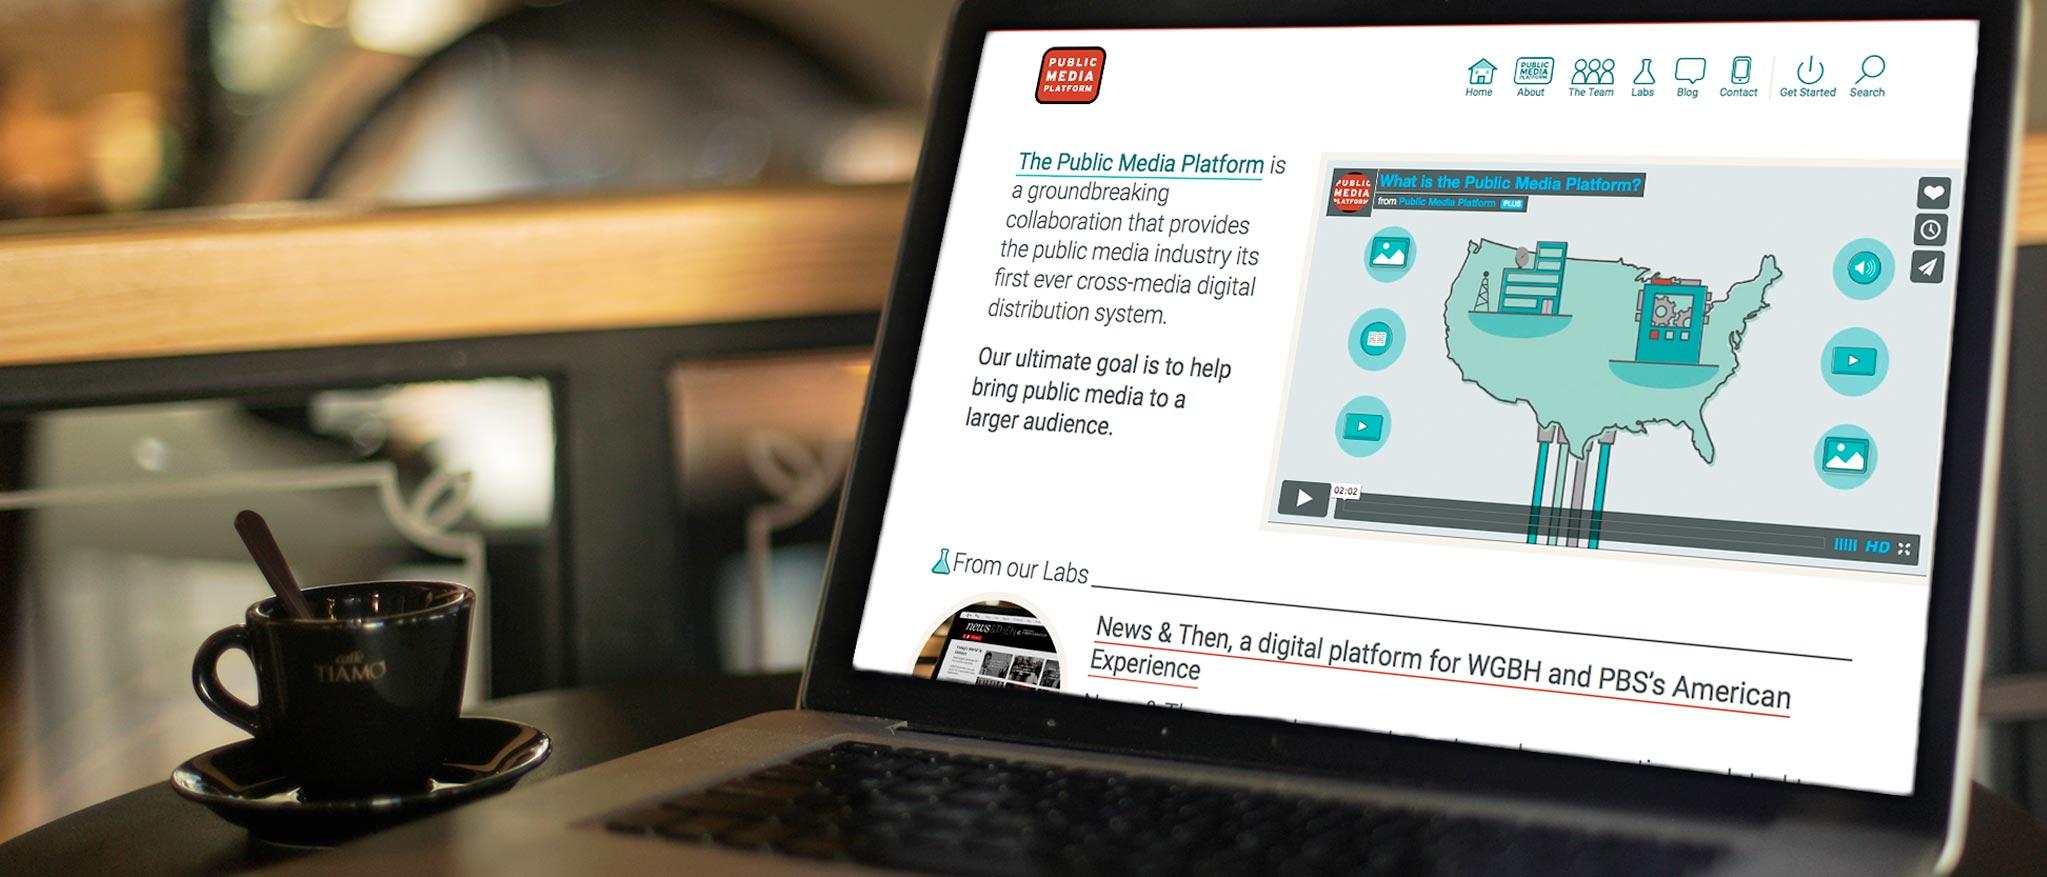 the Public Media Platform design on a laptop